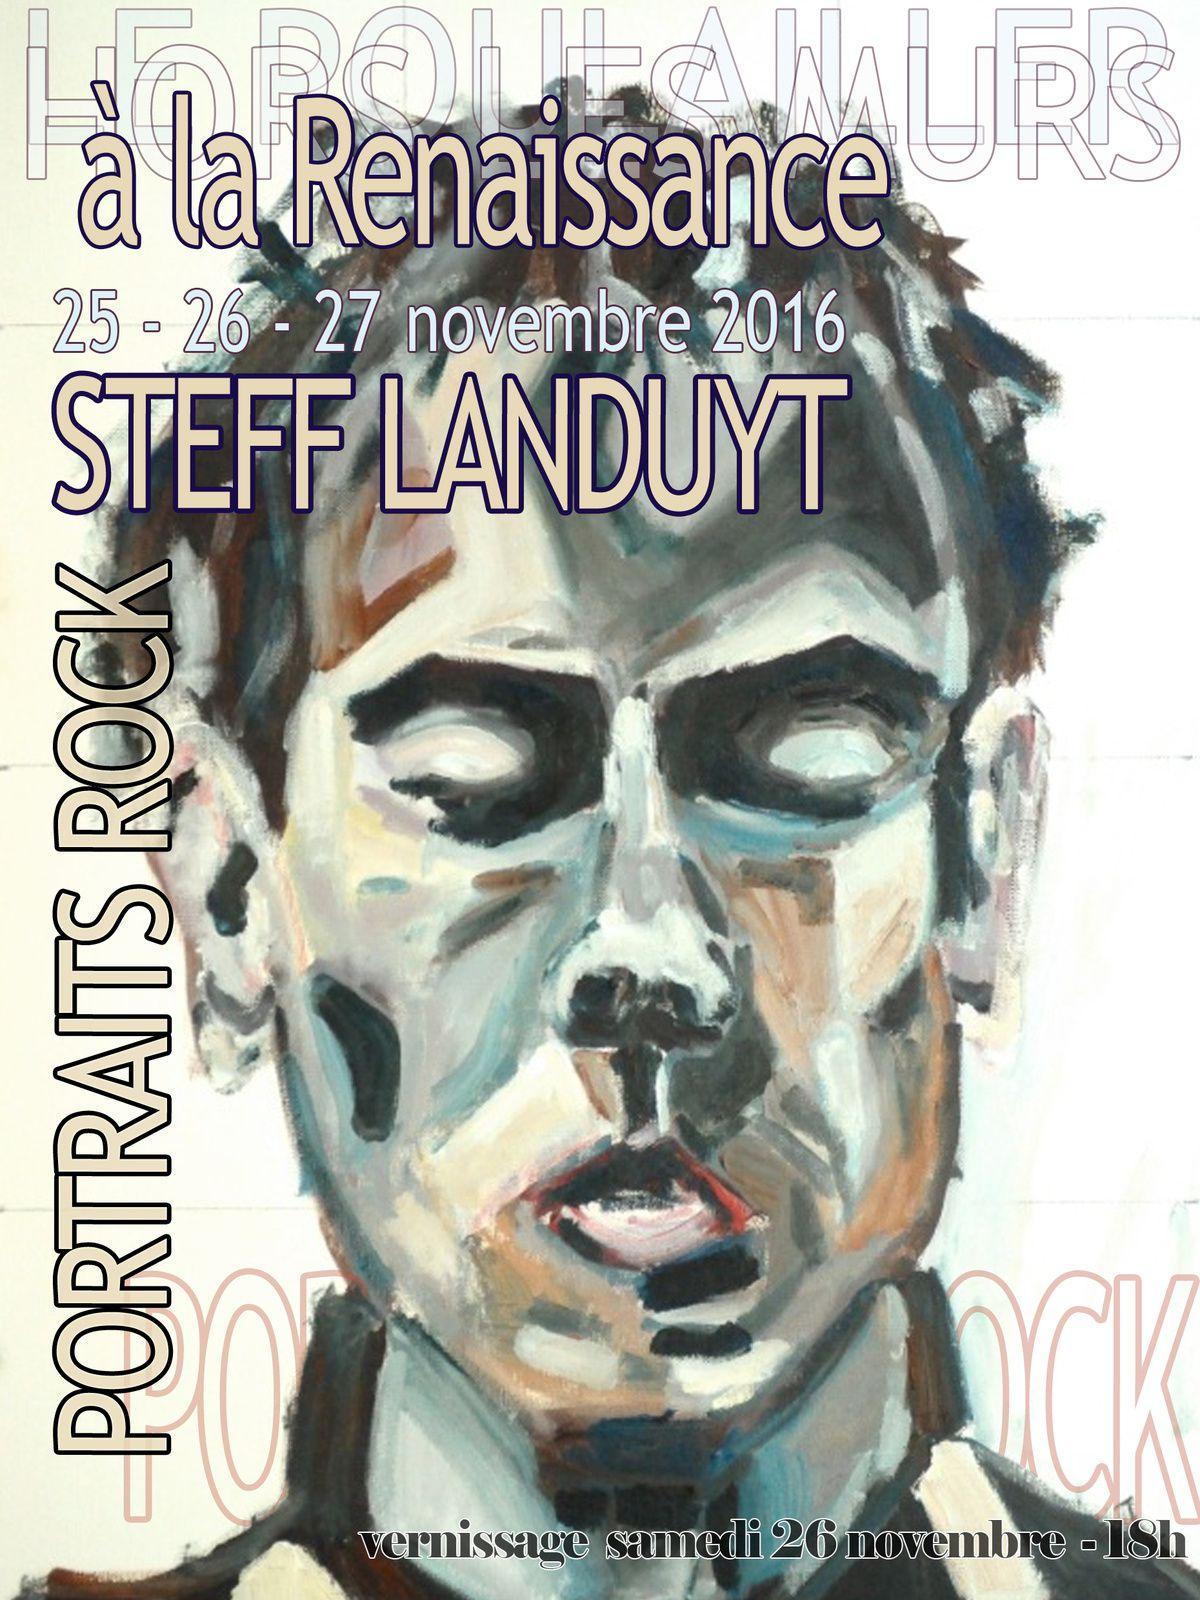 Steff Landuyt - Peter Murphy, janvier 2015